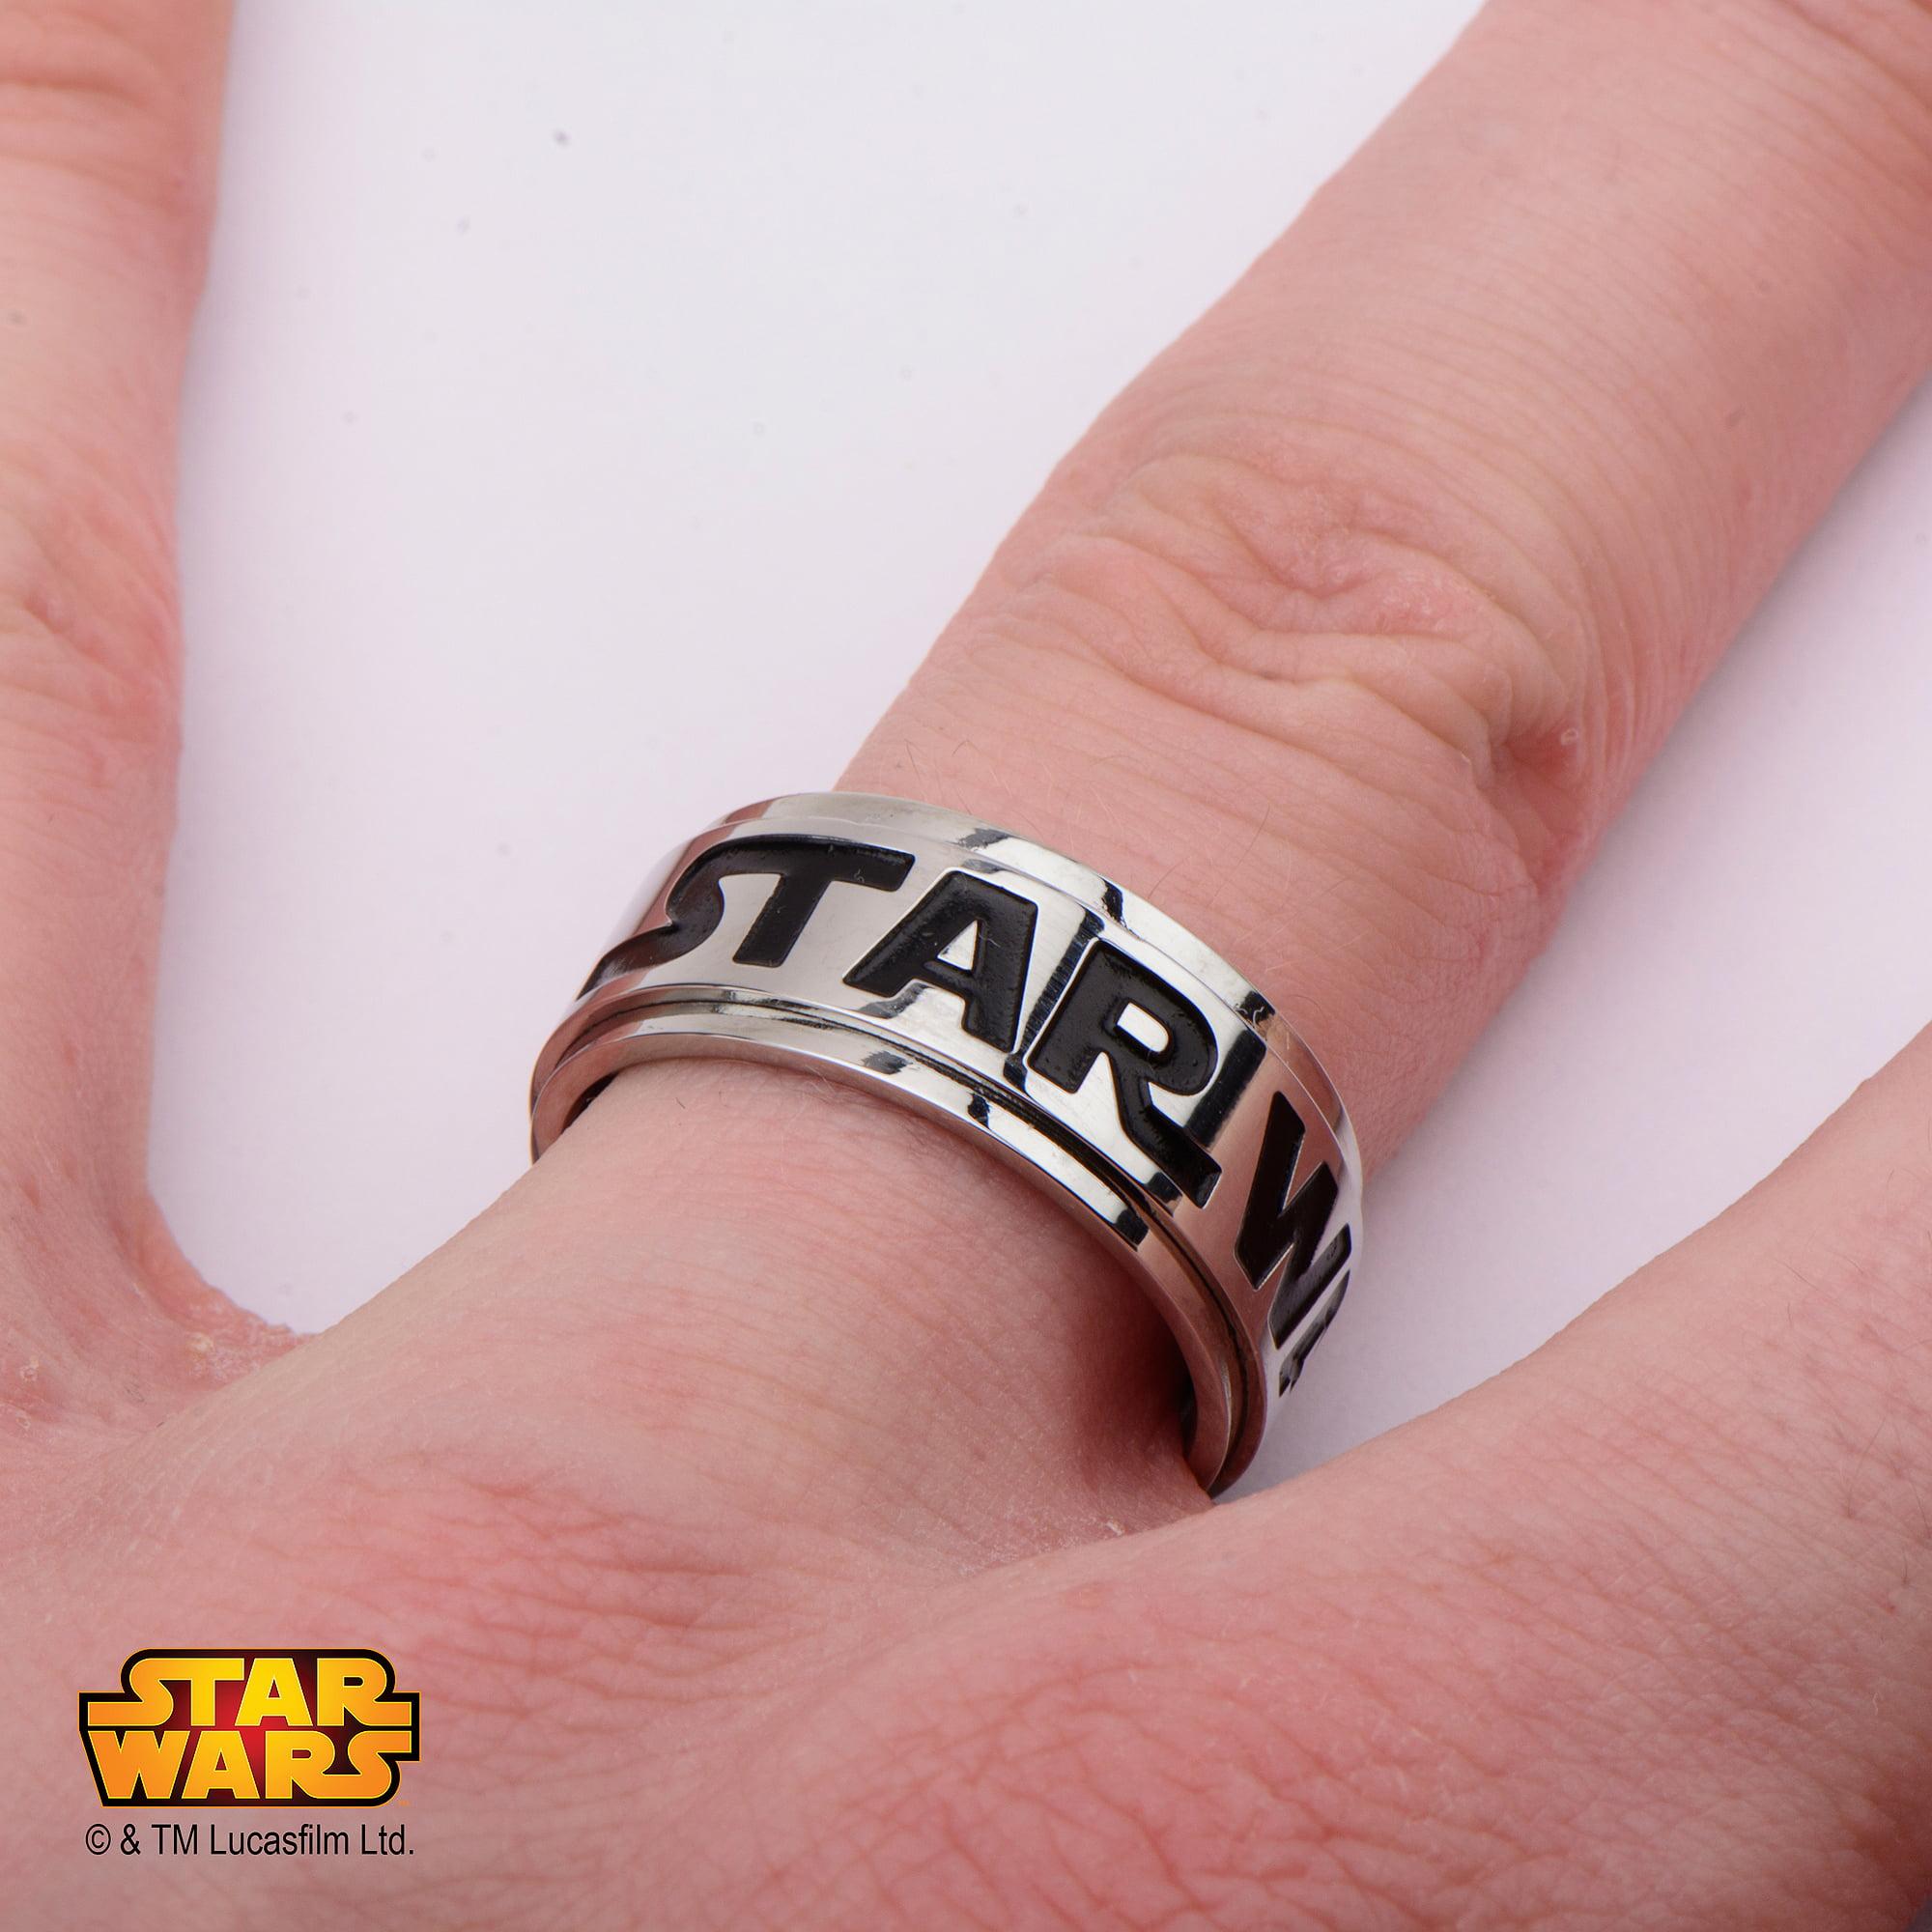 Disney Stainless Steel Star Wars Logo Spinner Ring - Walmart.com